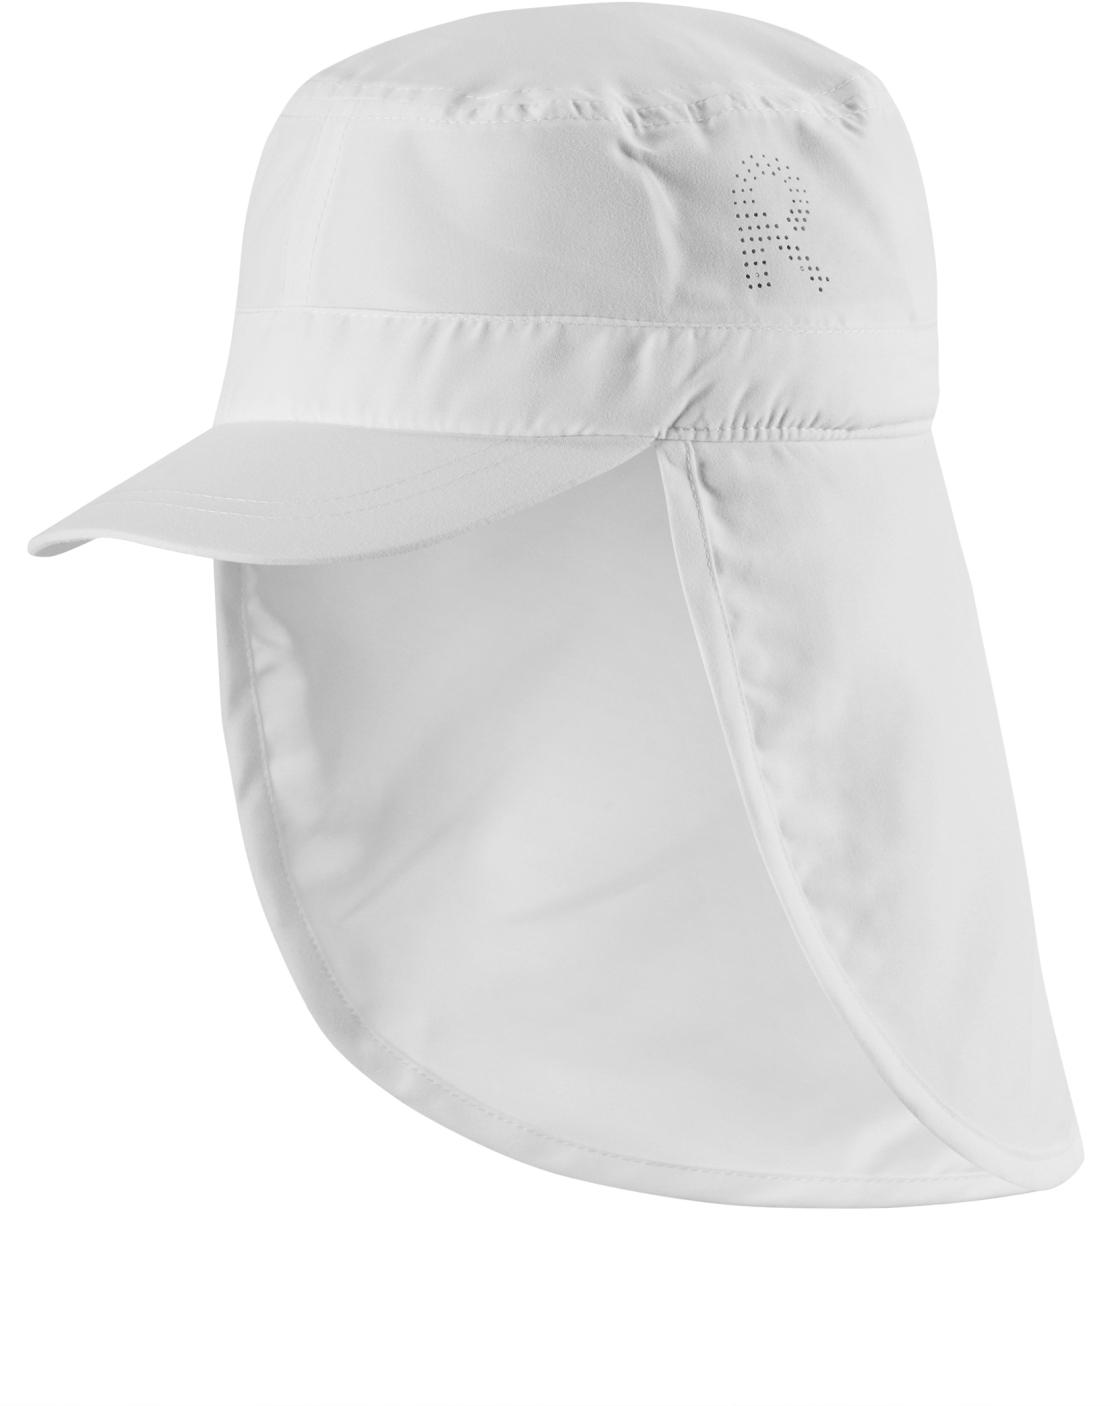 3fe6c87d9e5 Dětská UV čepice proti slunci Reima Aloha - white - Skibi Kids